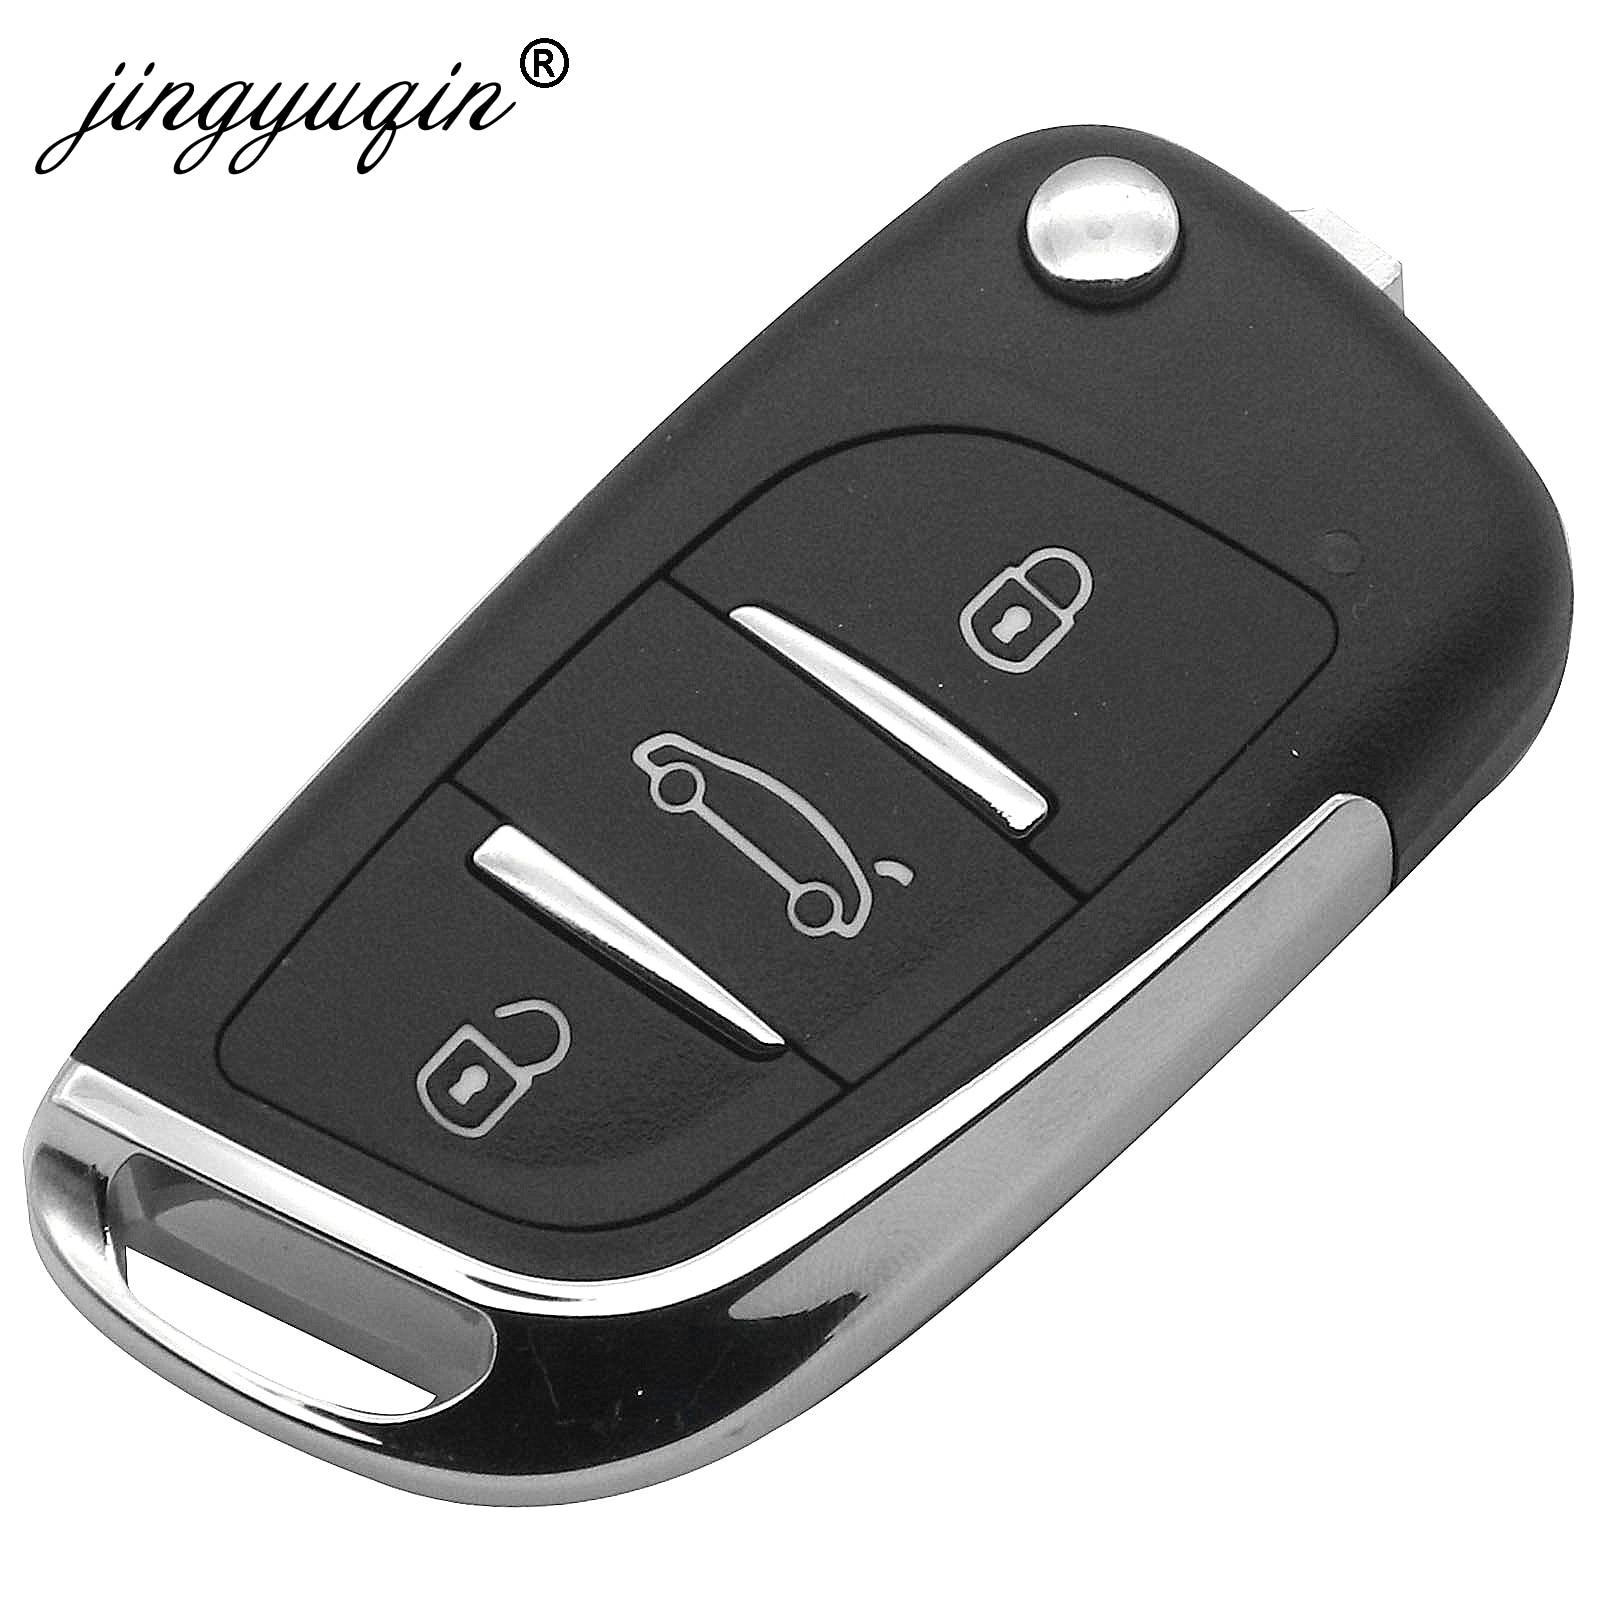 jingyuqin 5Pcs Lot KD900 KD900 KD200 URG200 Mini KD KD X2 Remote Control 3 Button Key